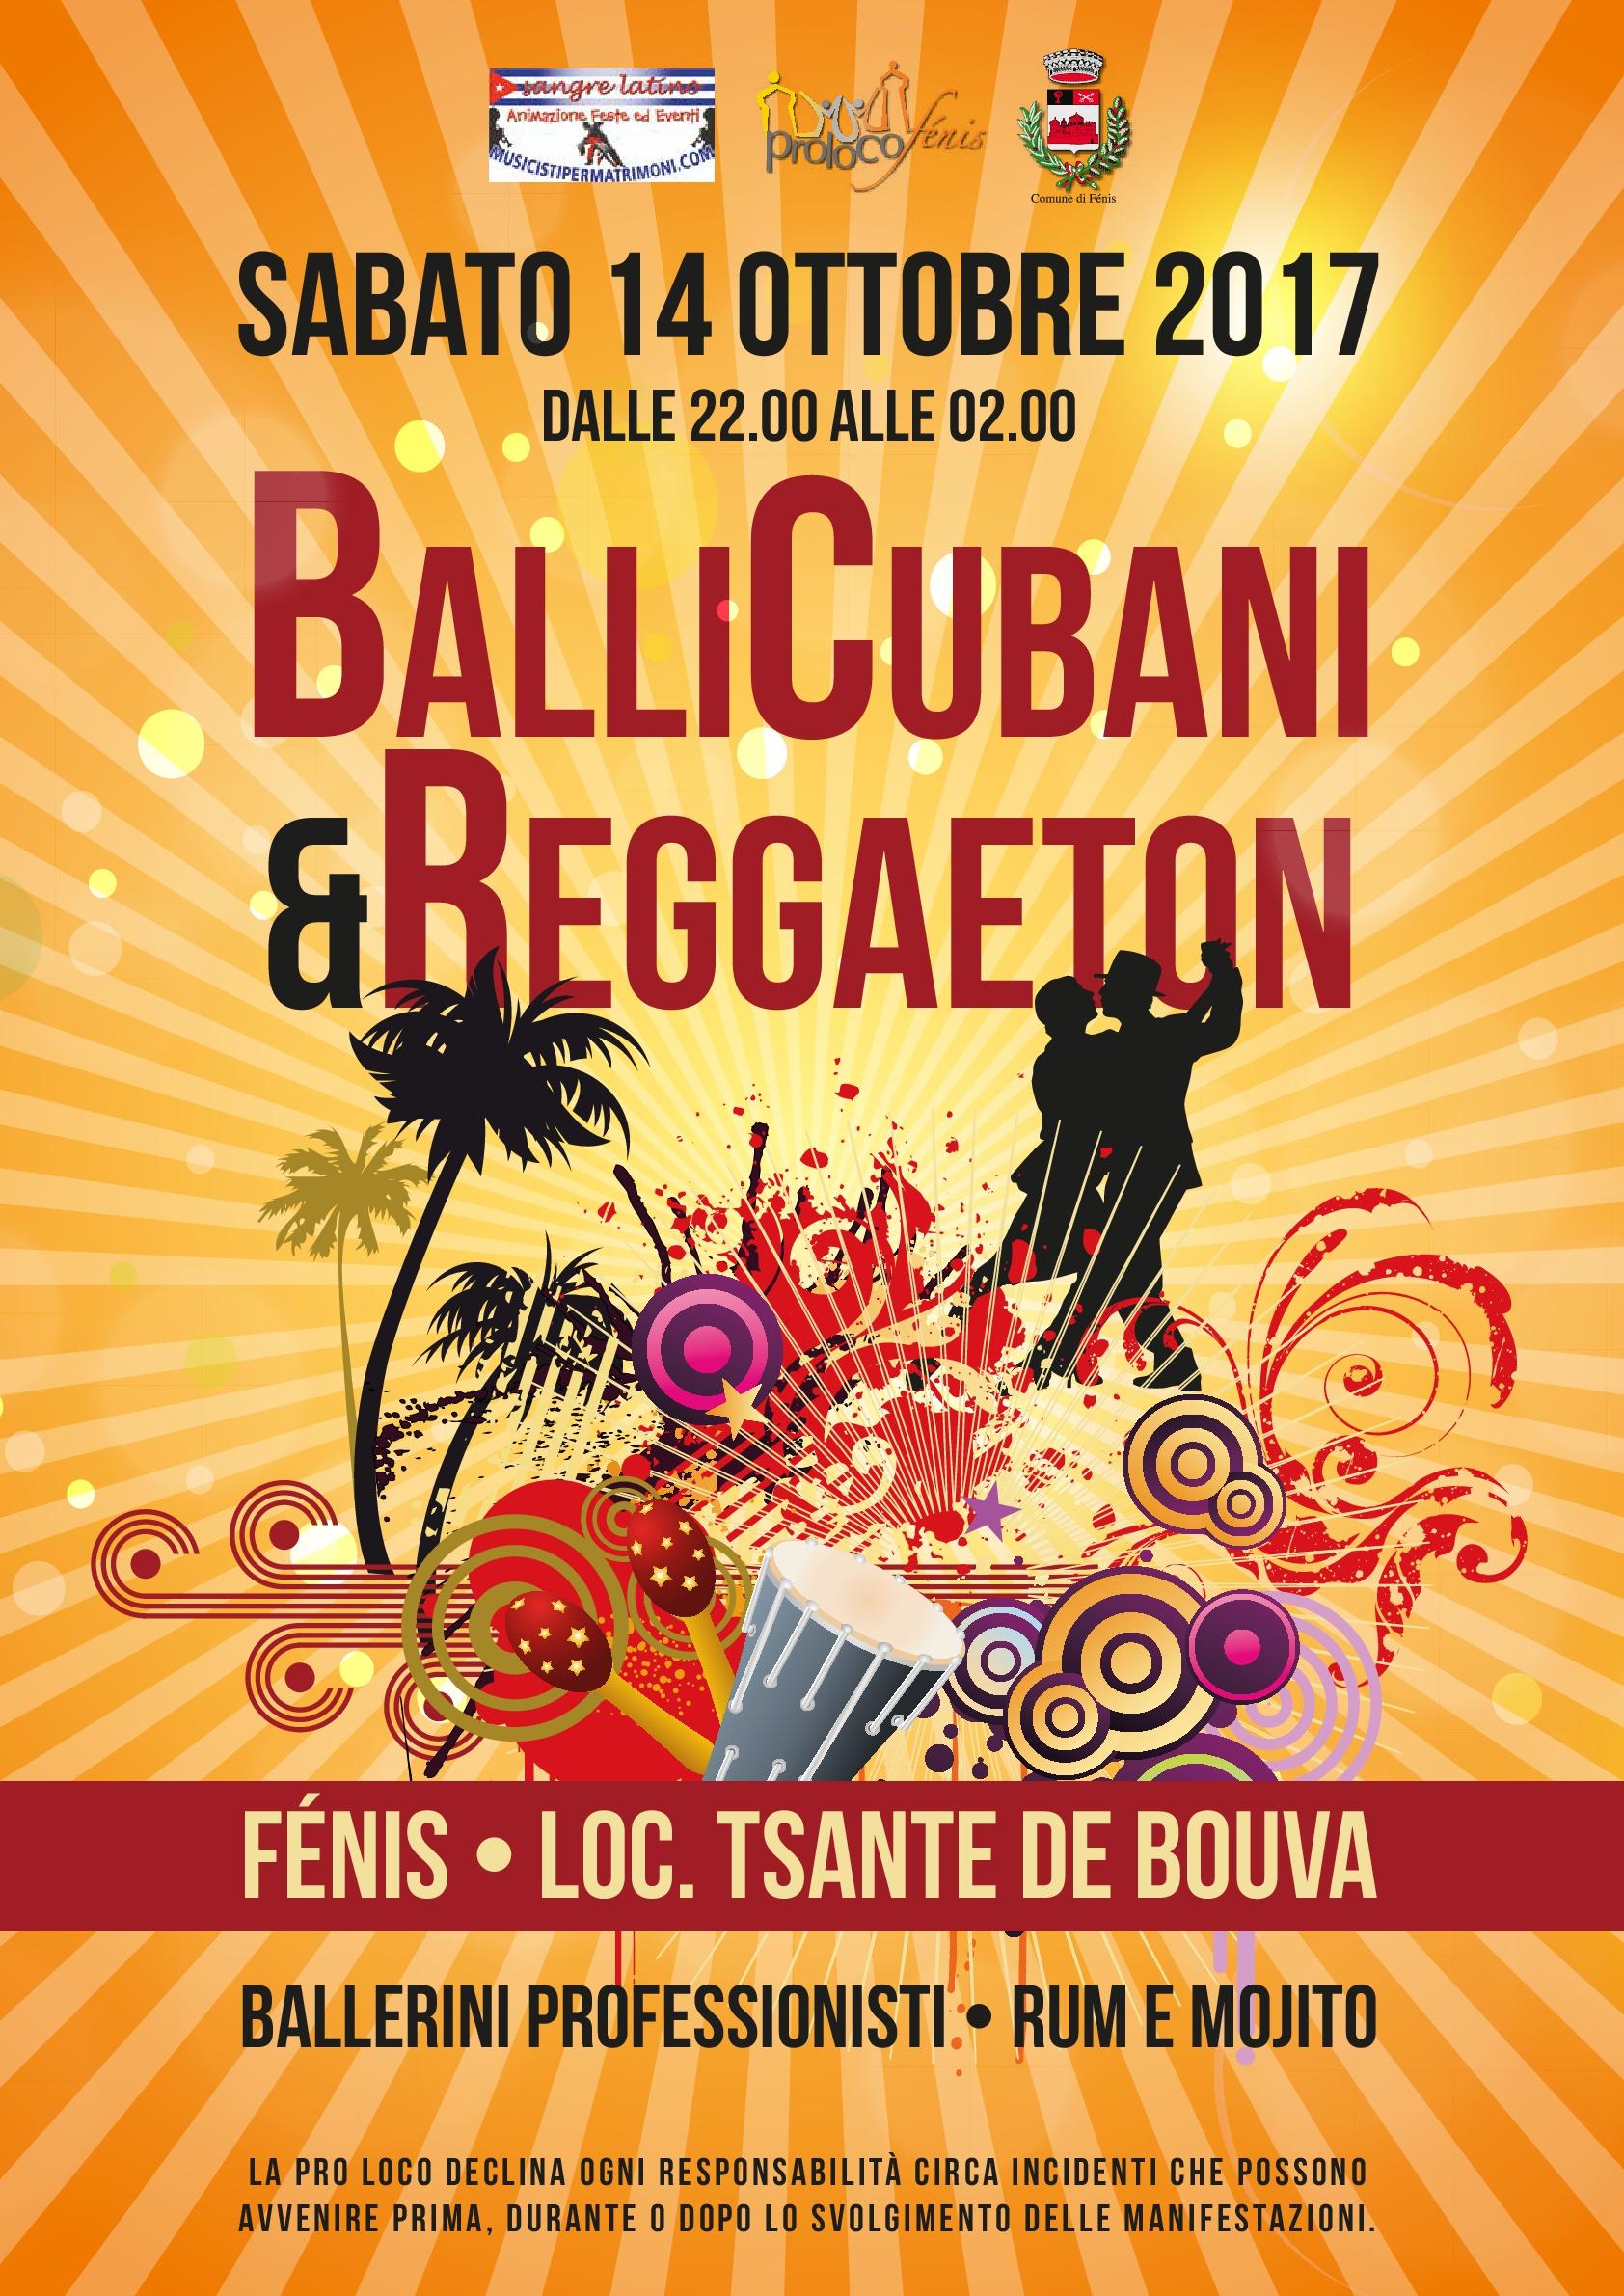 festa cubana aosta musica latina